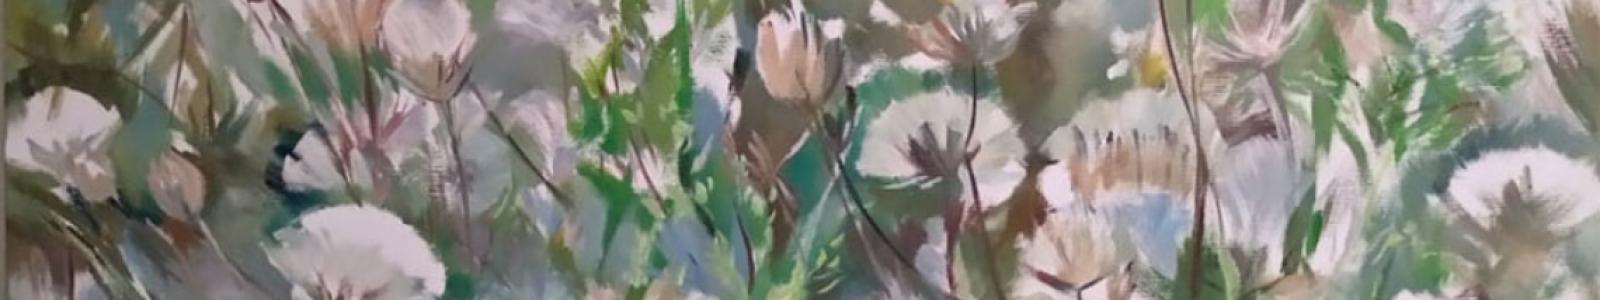 Gallery Painter Natali Romanovskaya